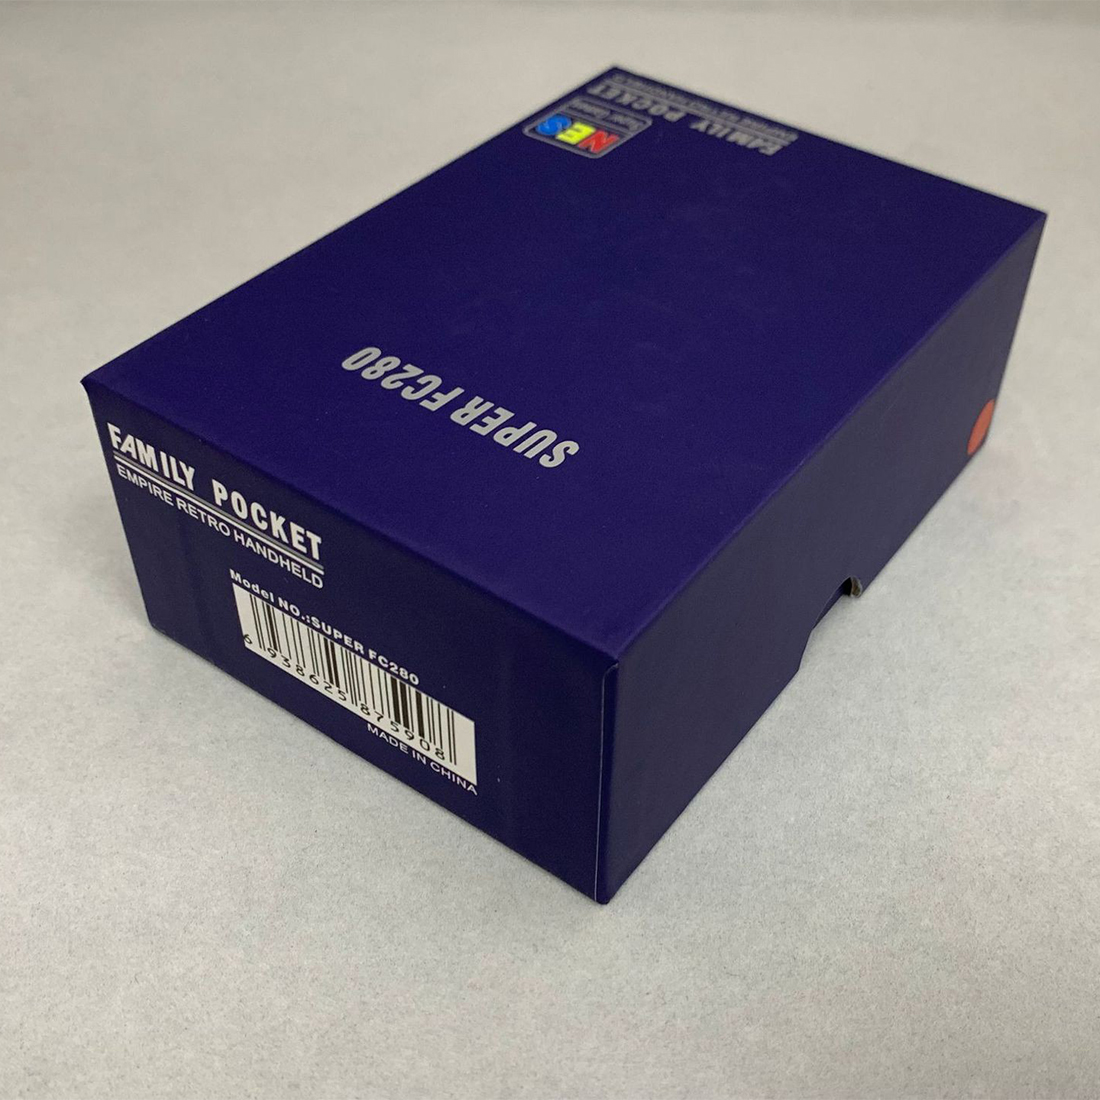 400 Games Handheld Console Retro Video Game Player Mini Arcade Color Screen